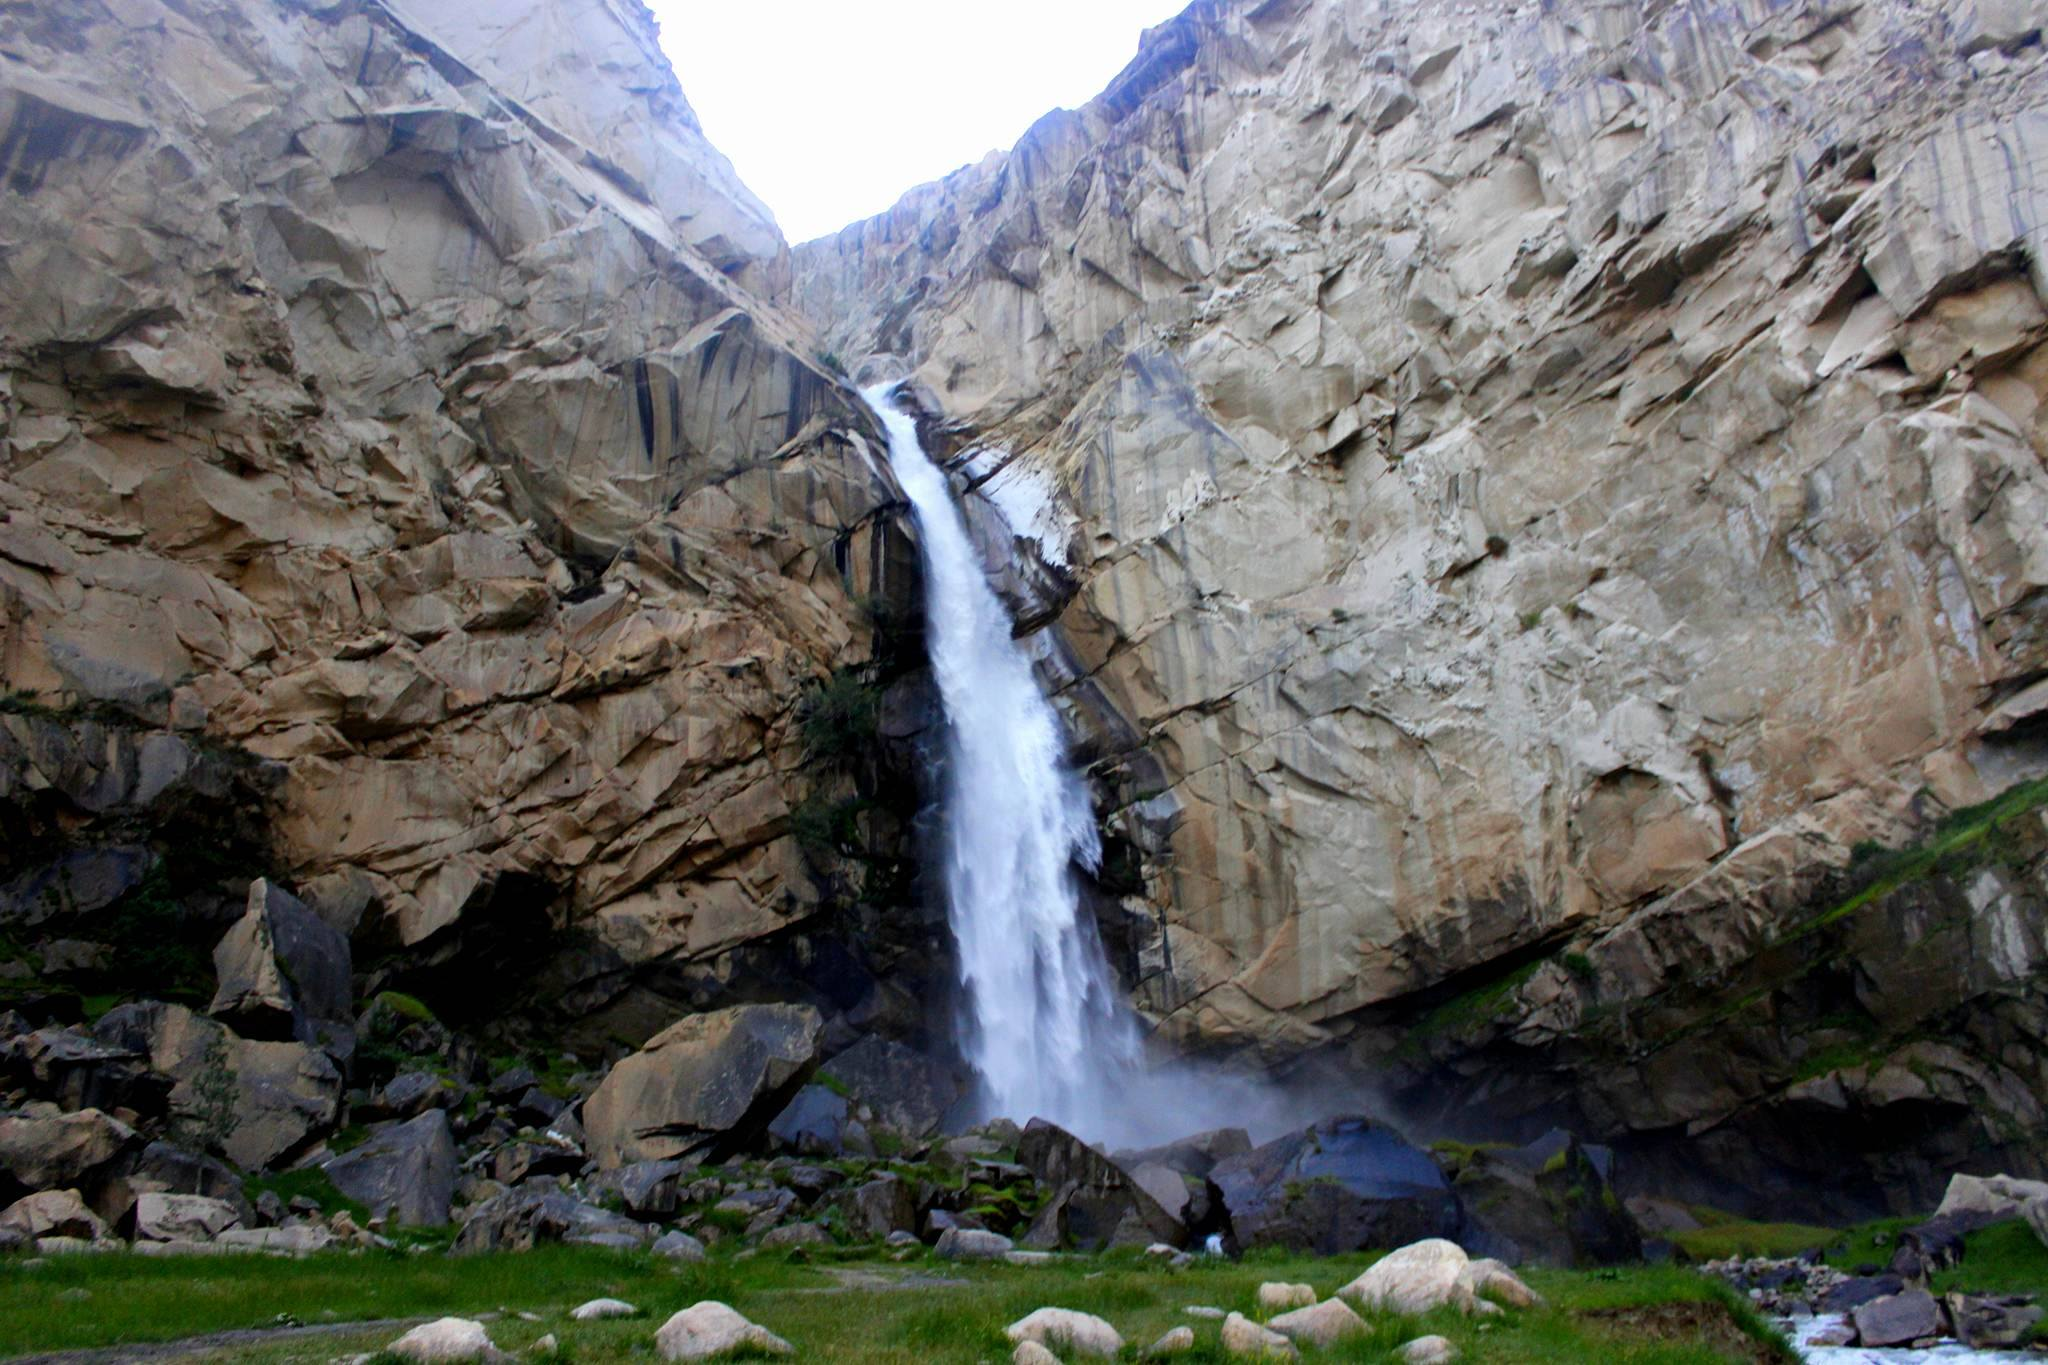 Khamosh Waterfalls in Gilgit Baltistan